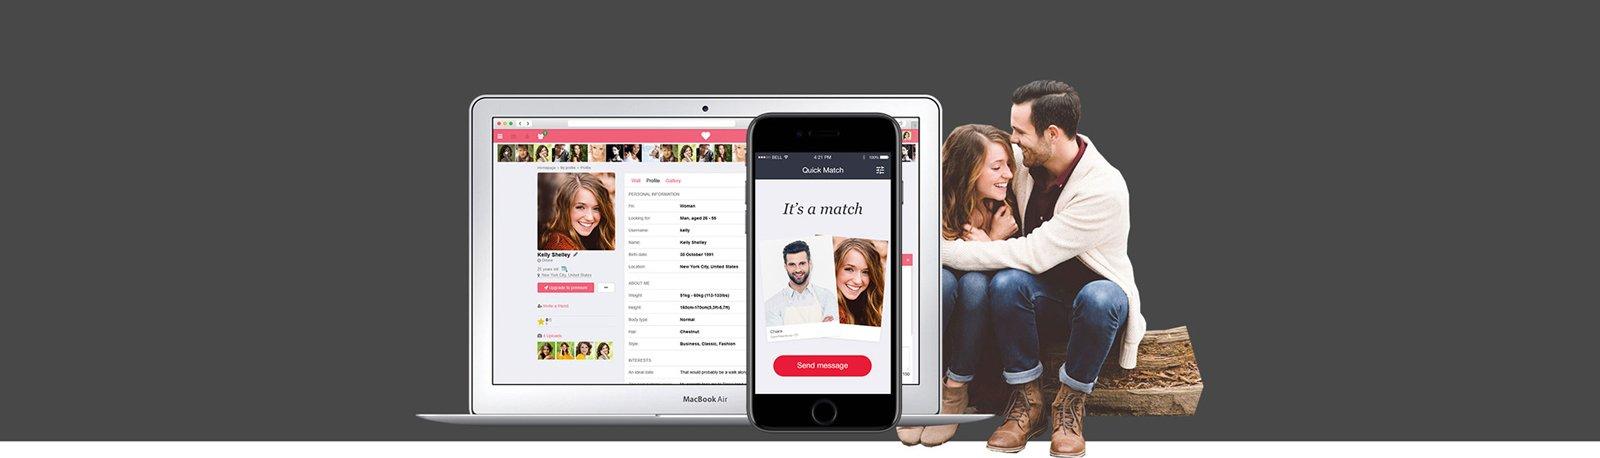 Larousse italiano francese online dating